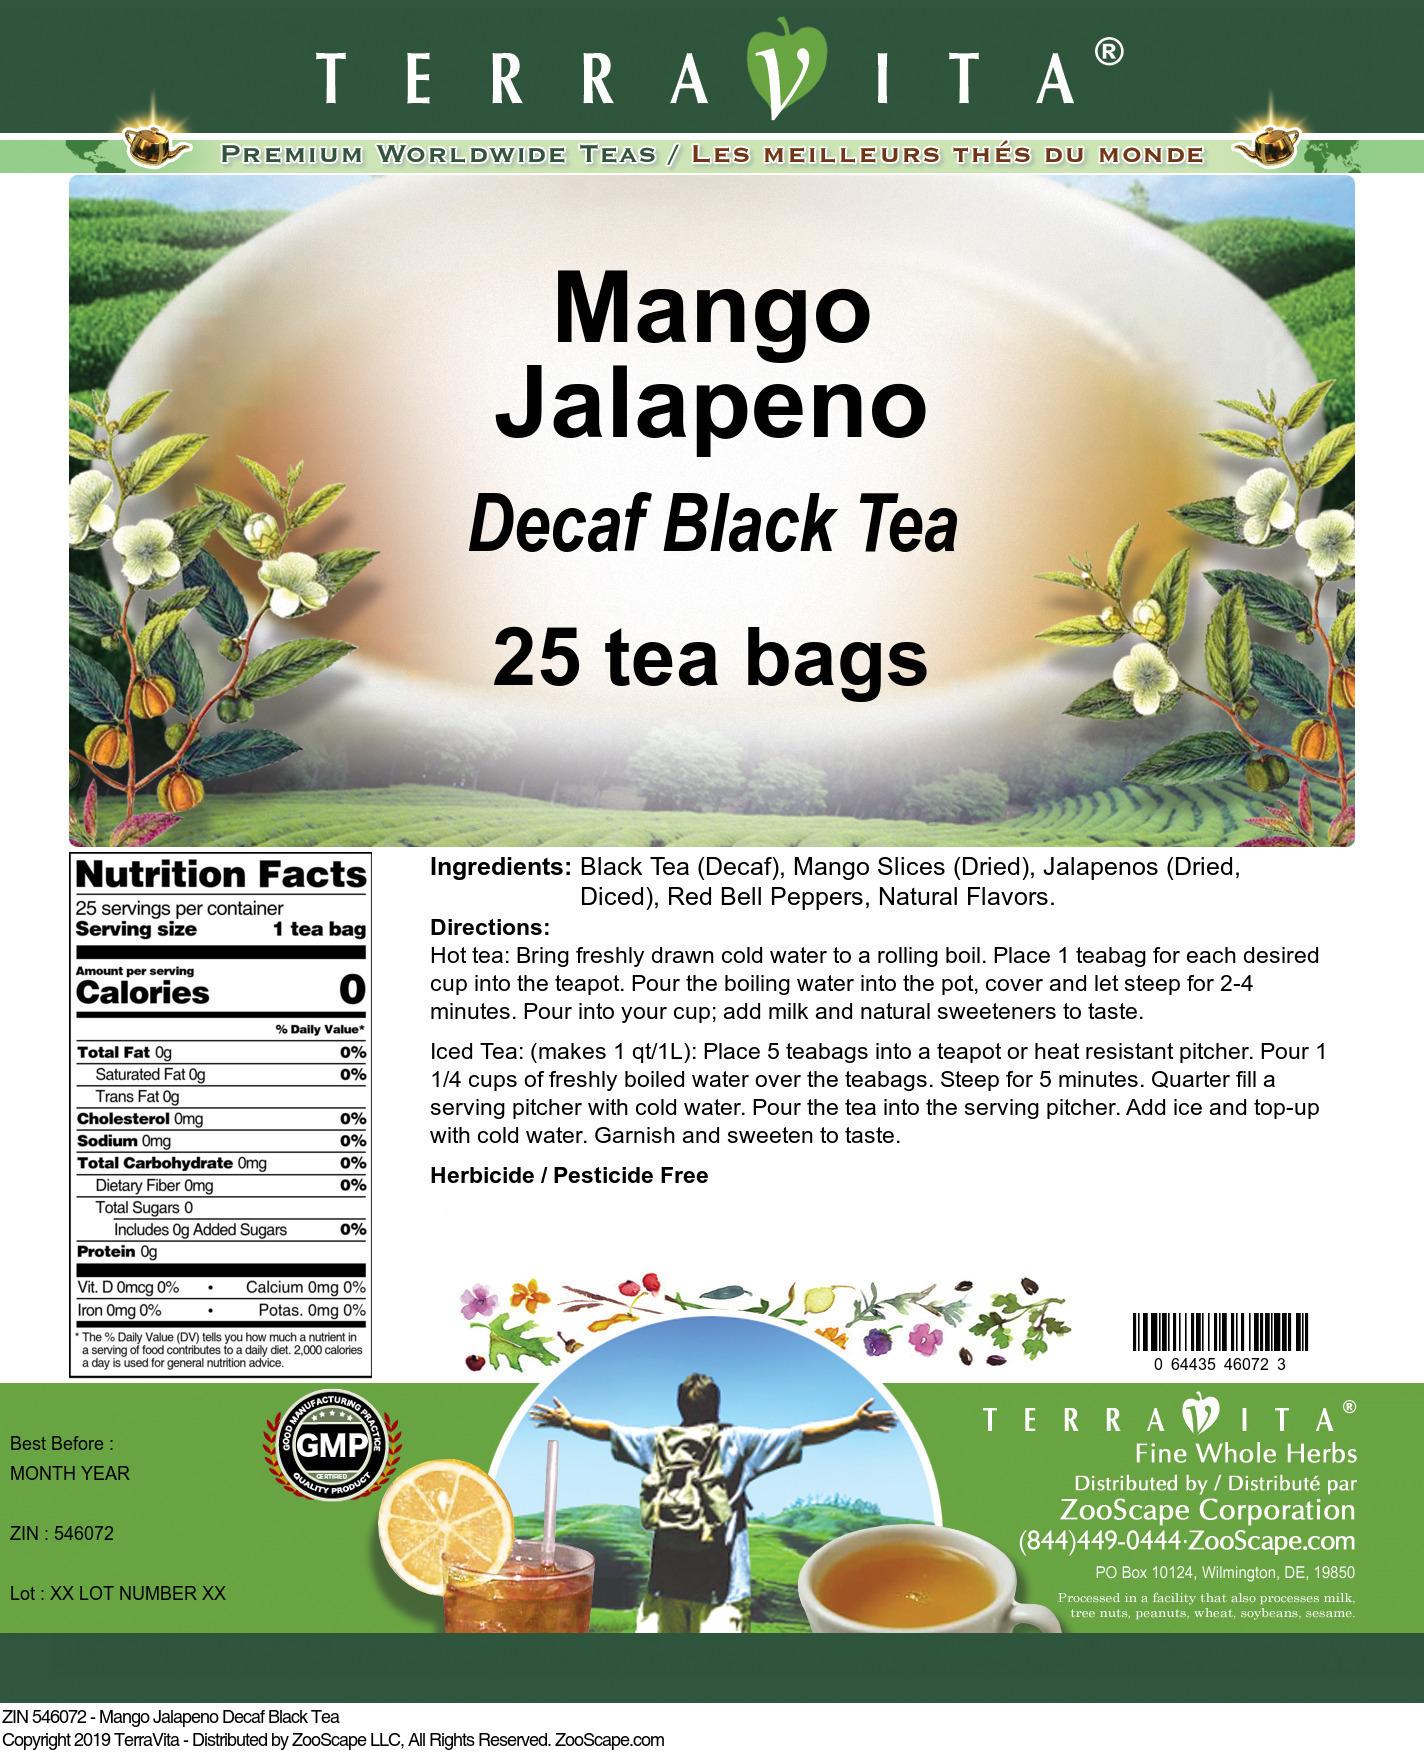 Mango Jalapeno Decaf Black Tea